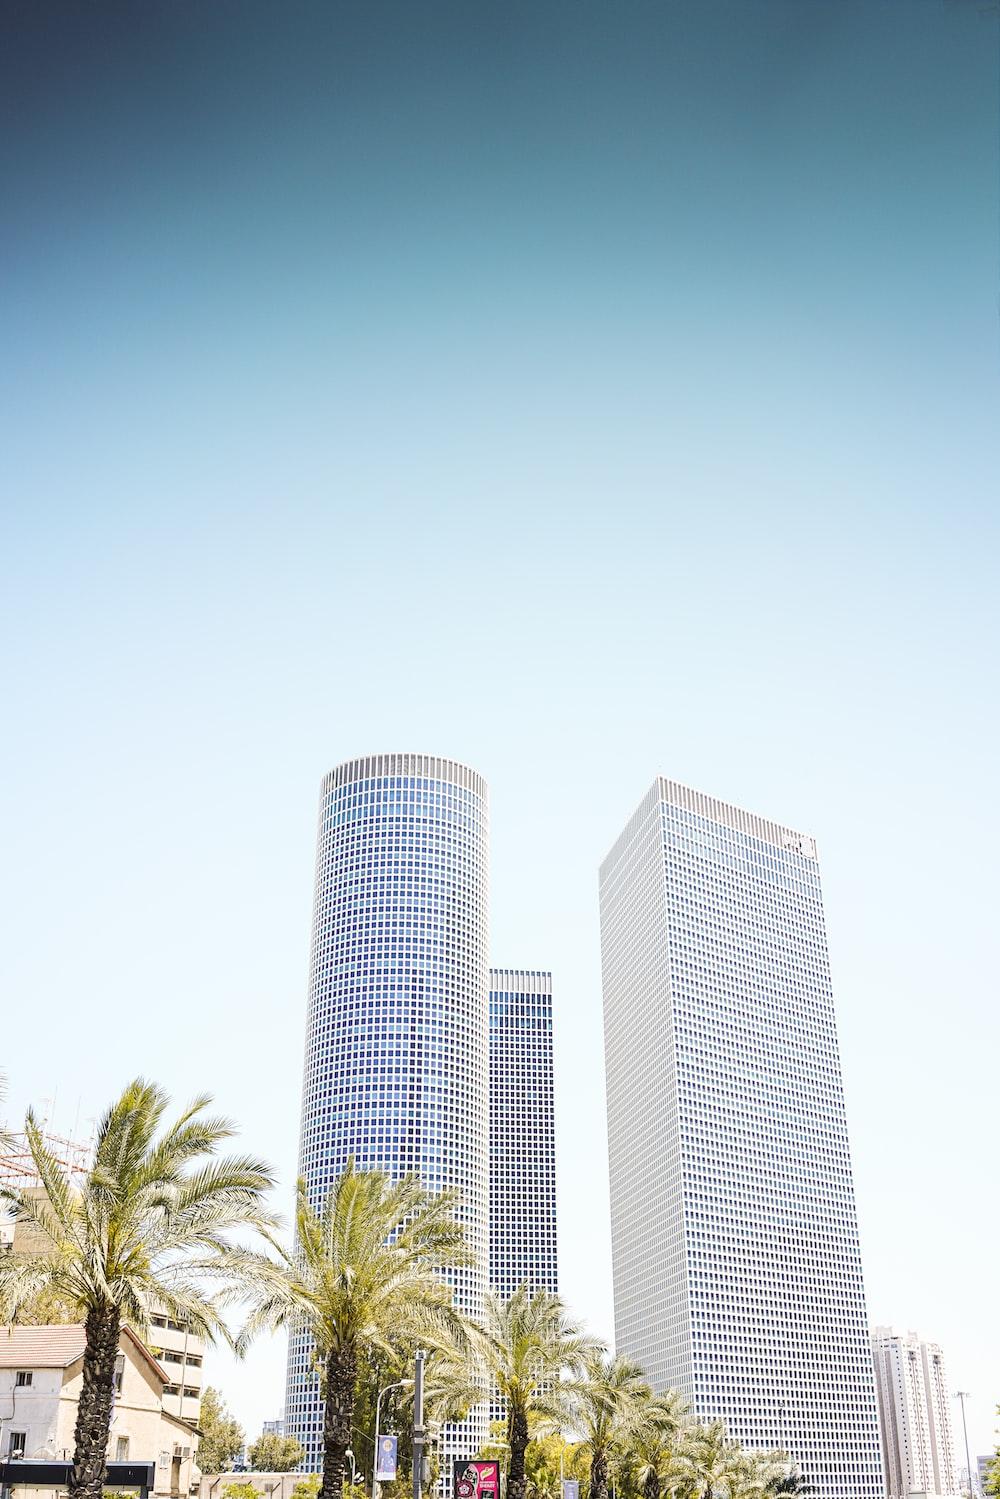 three high-rise buildings near palm trees